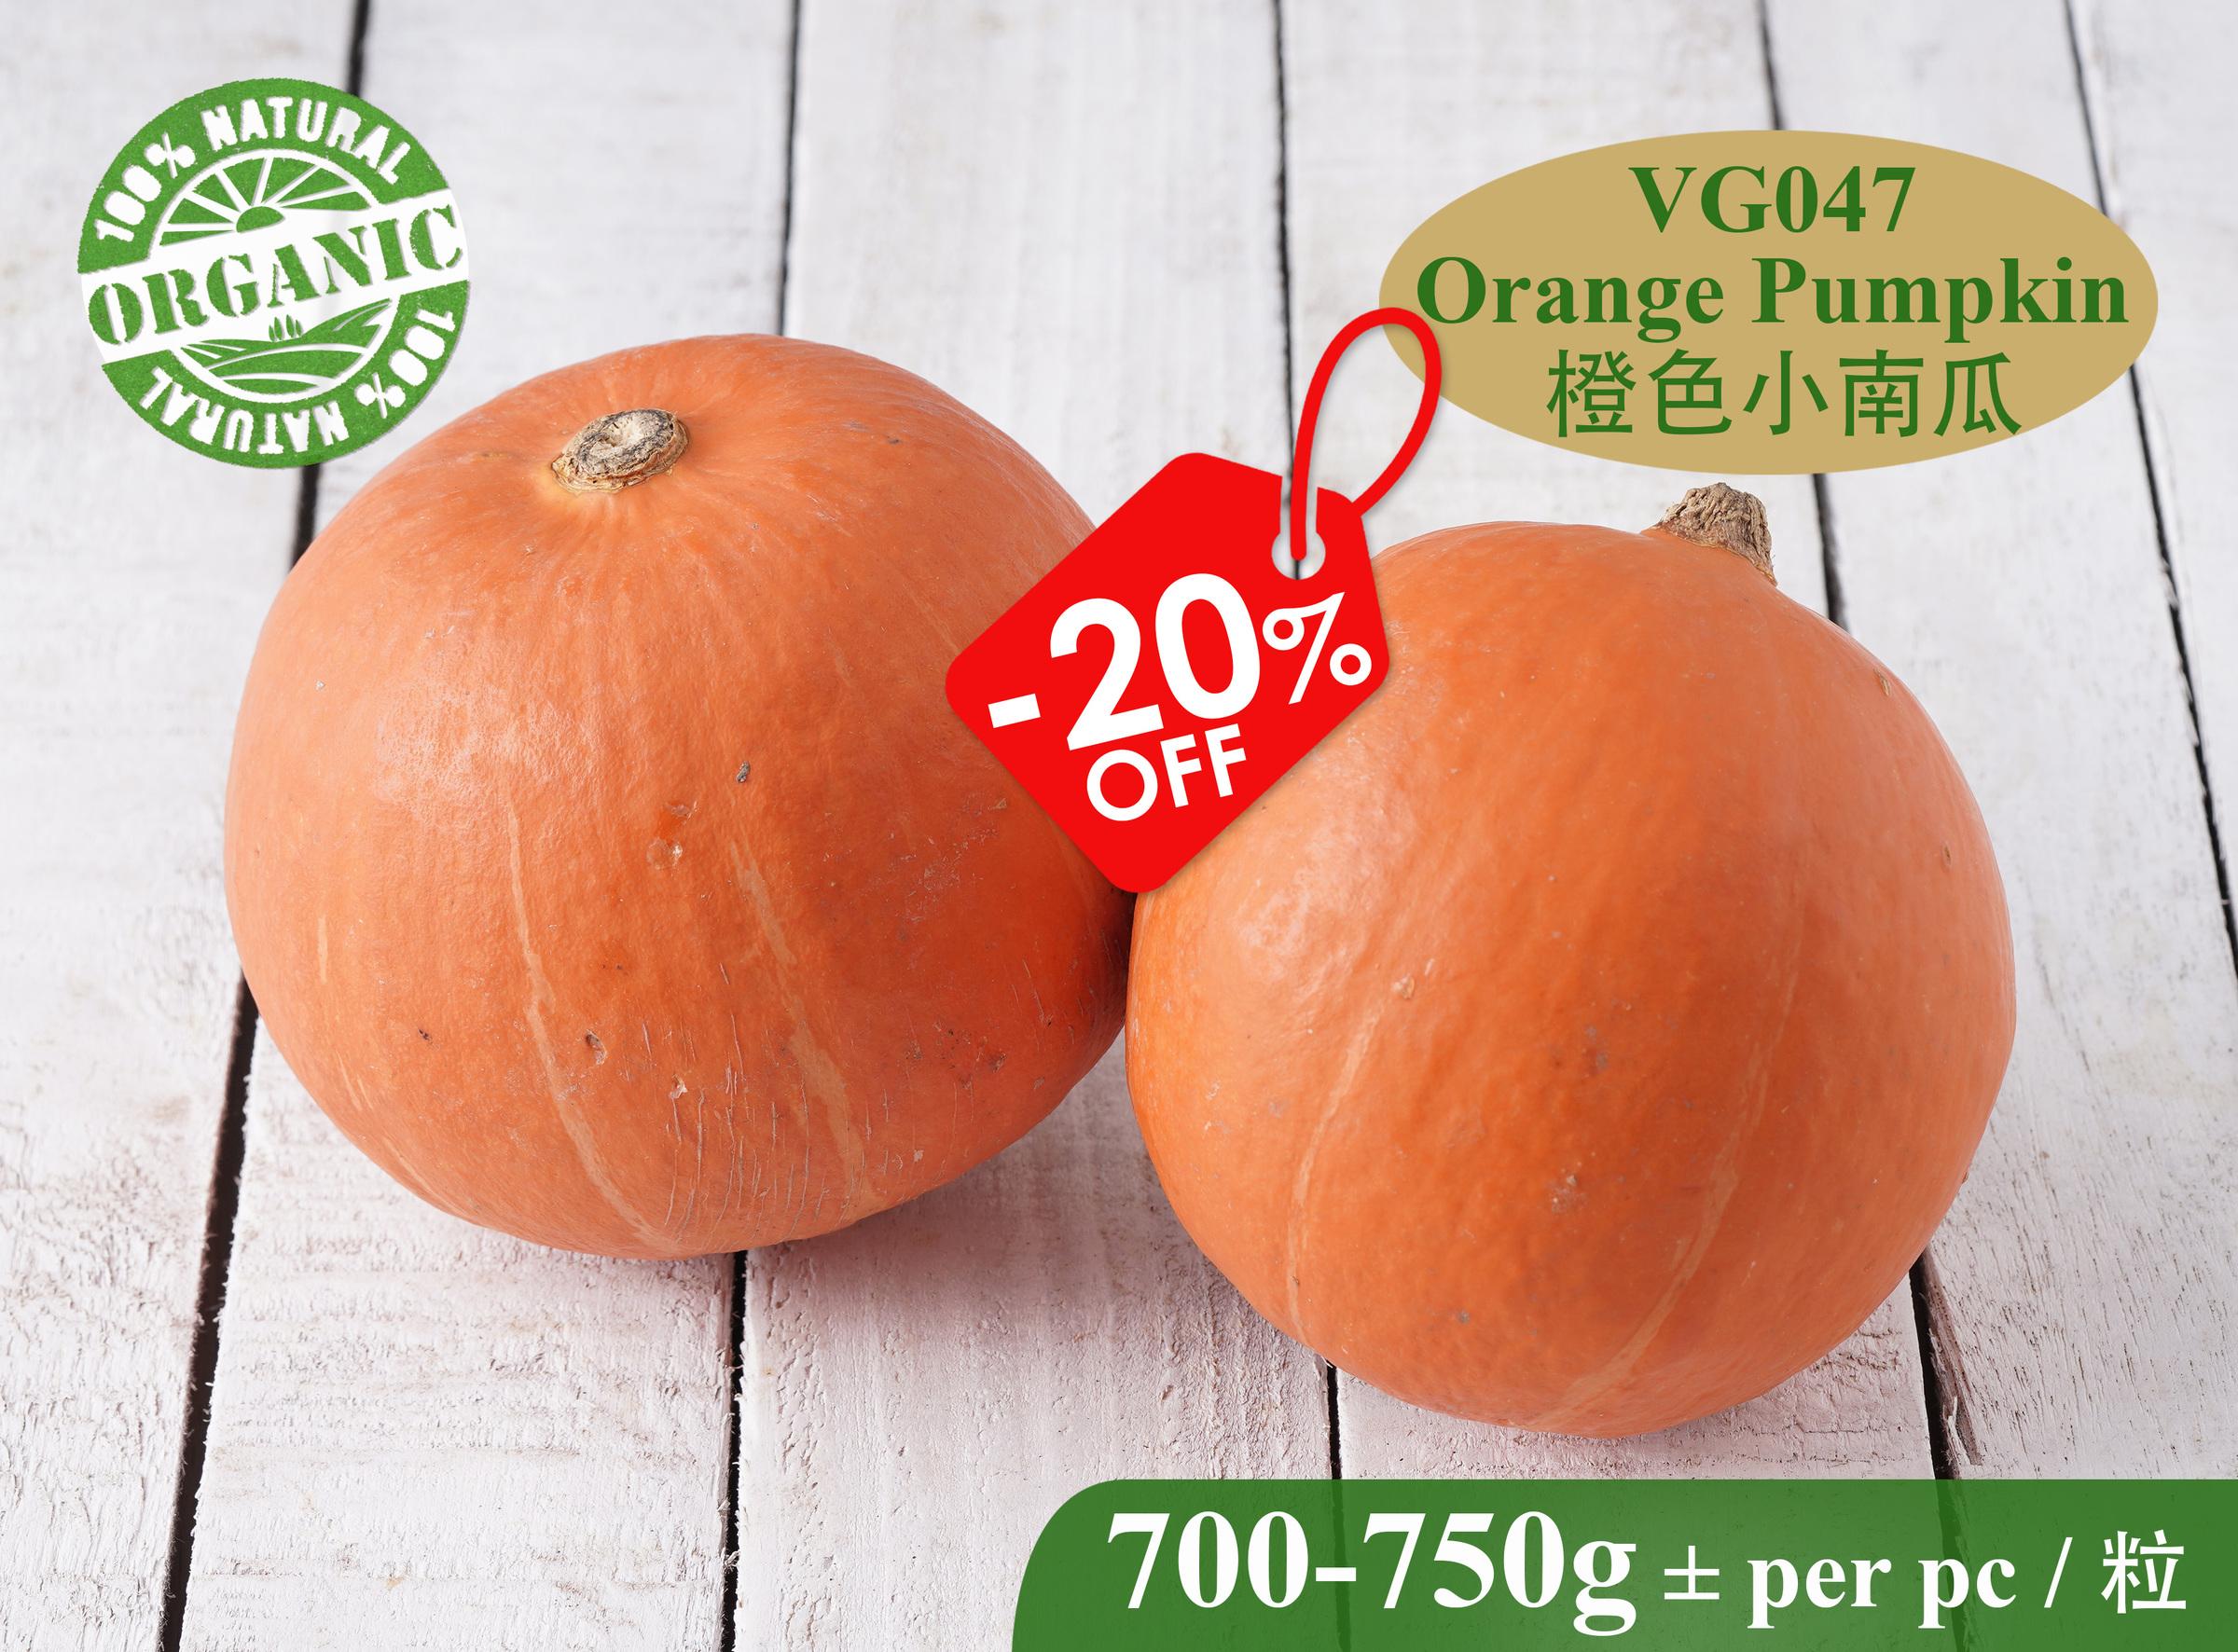 VG047 Orange Pumpkin-RM20.00 per kg+.jpg